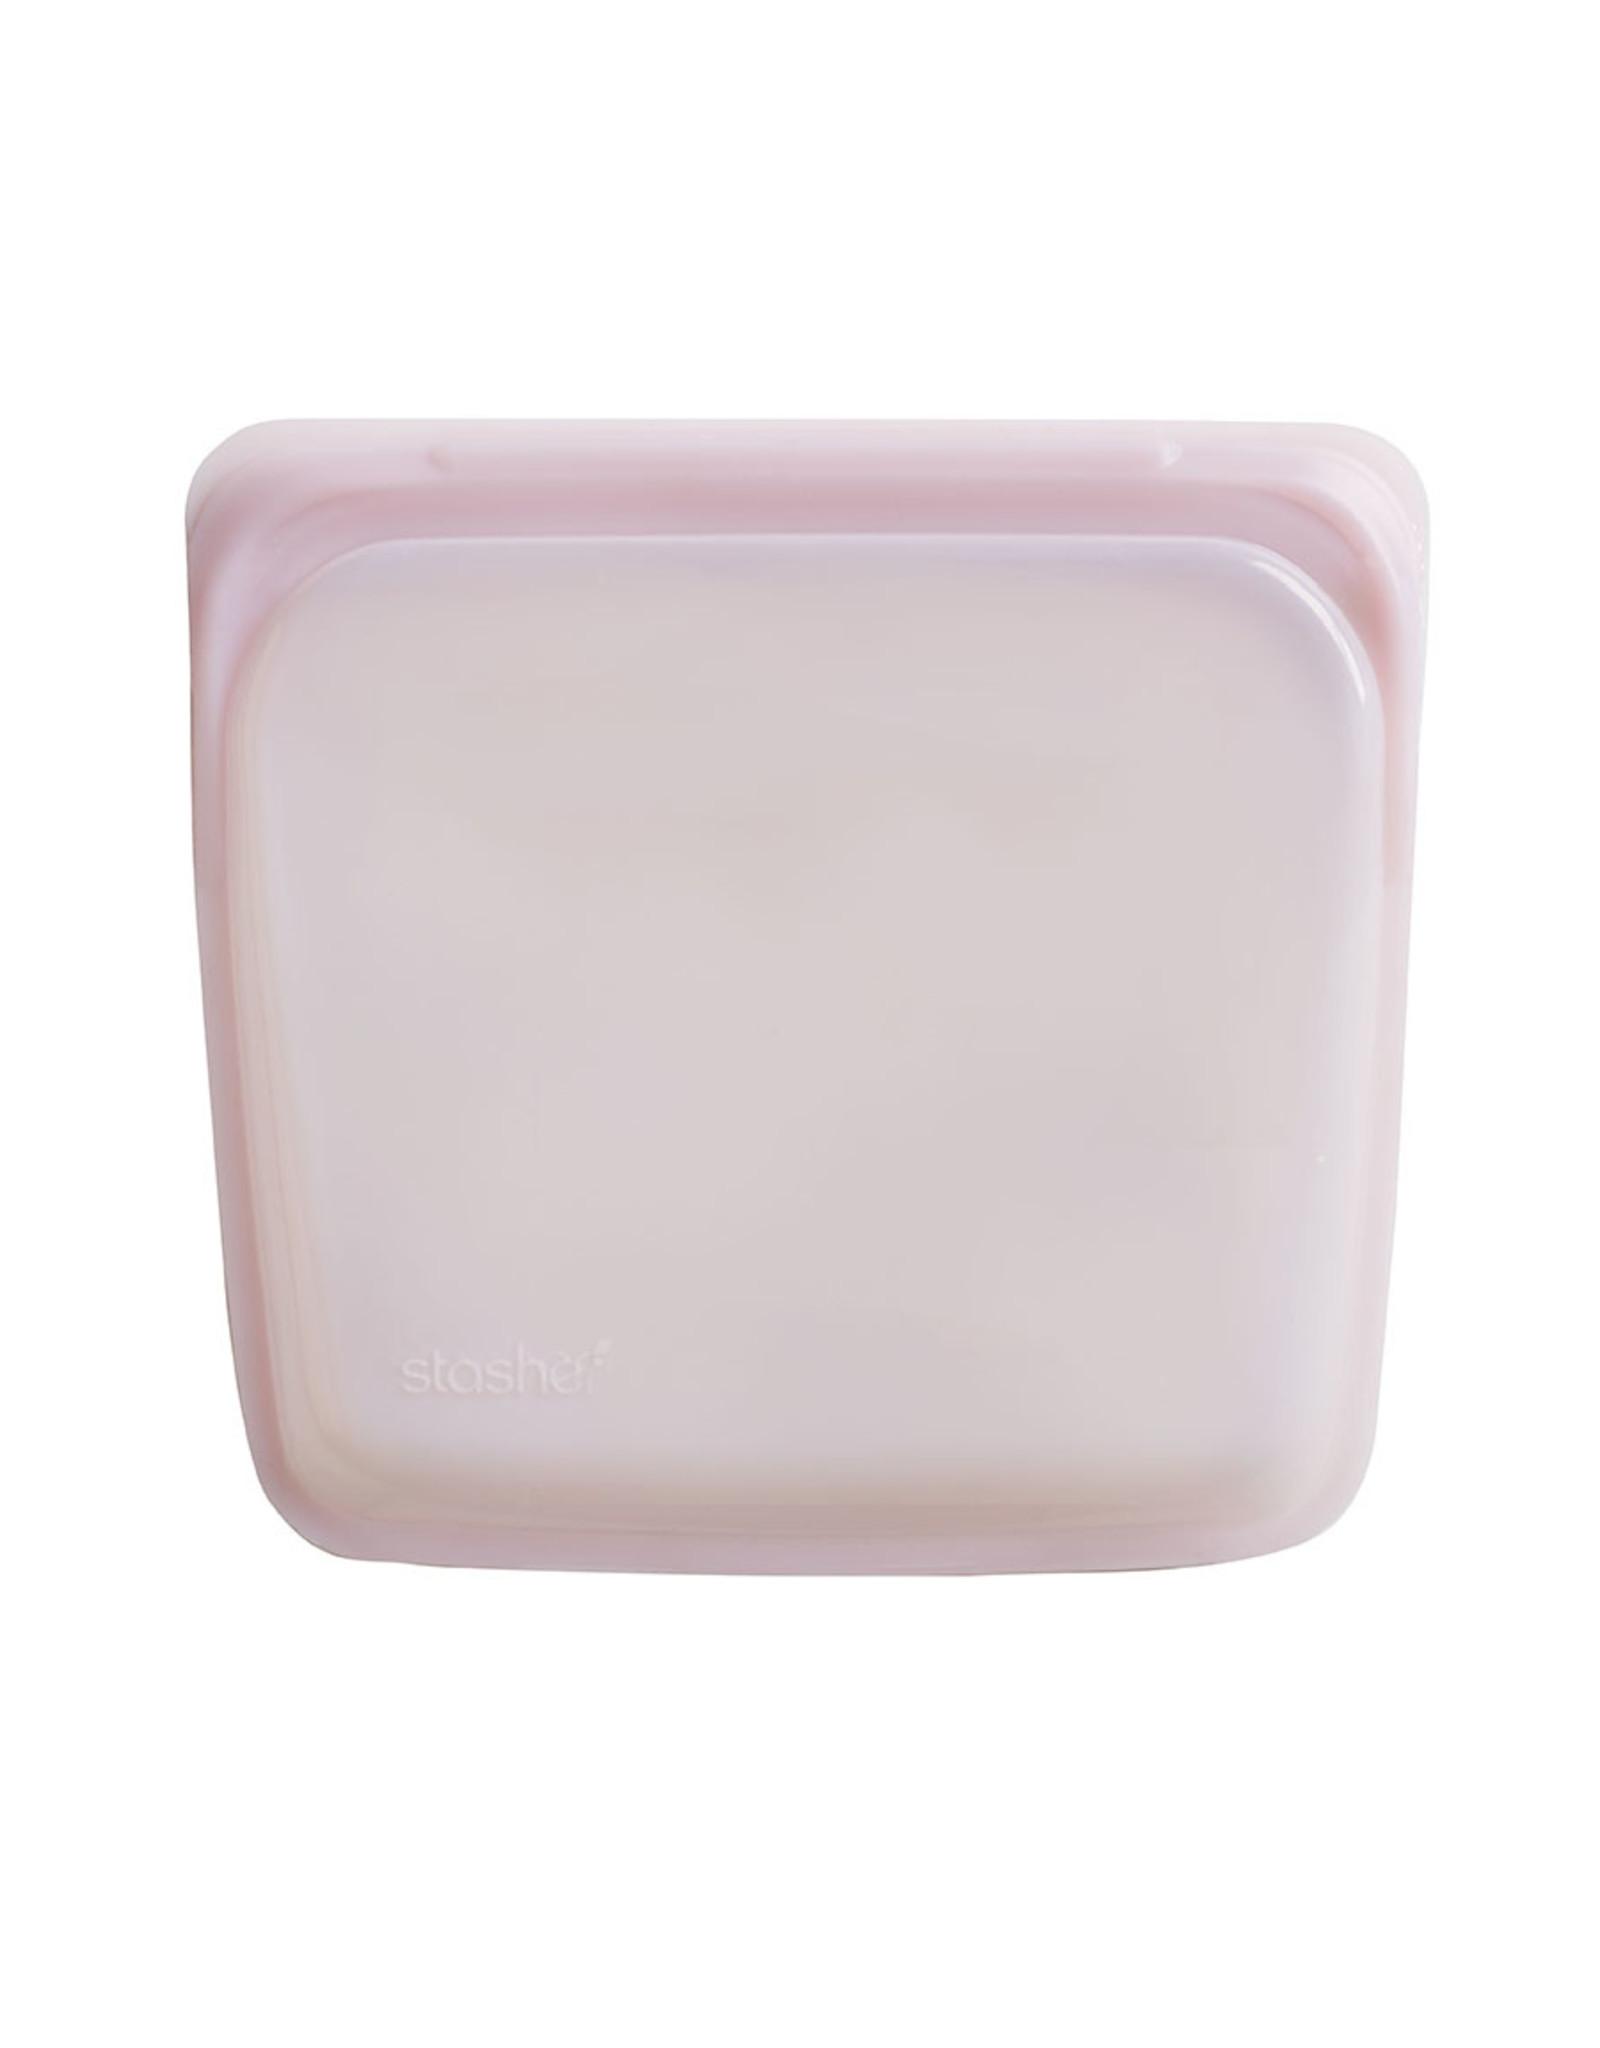 Stasher Bag Stasher bag - Rose quartz